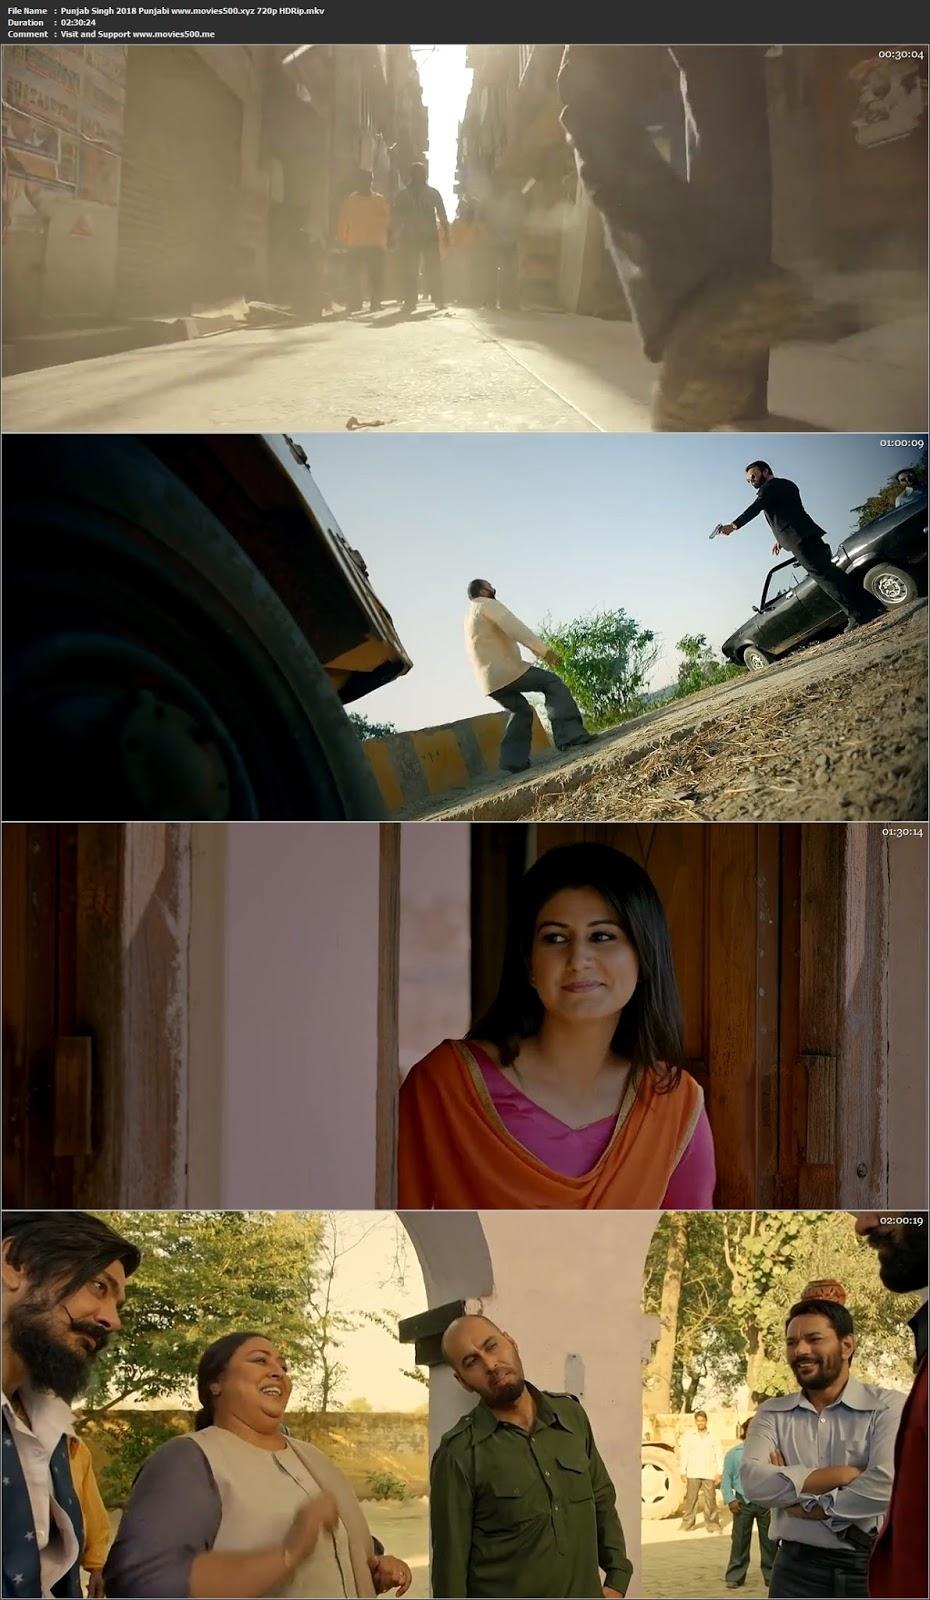 Punjab Singh 2018 Punjabi Full Movie HDRip 720p at scientologymag.com